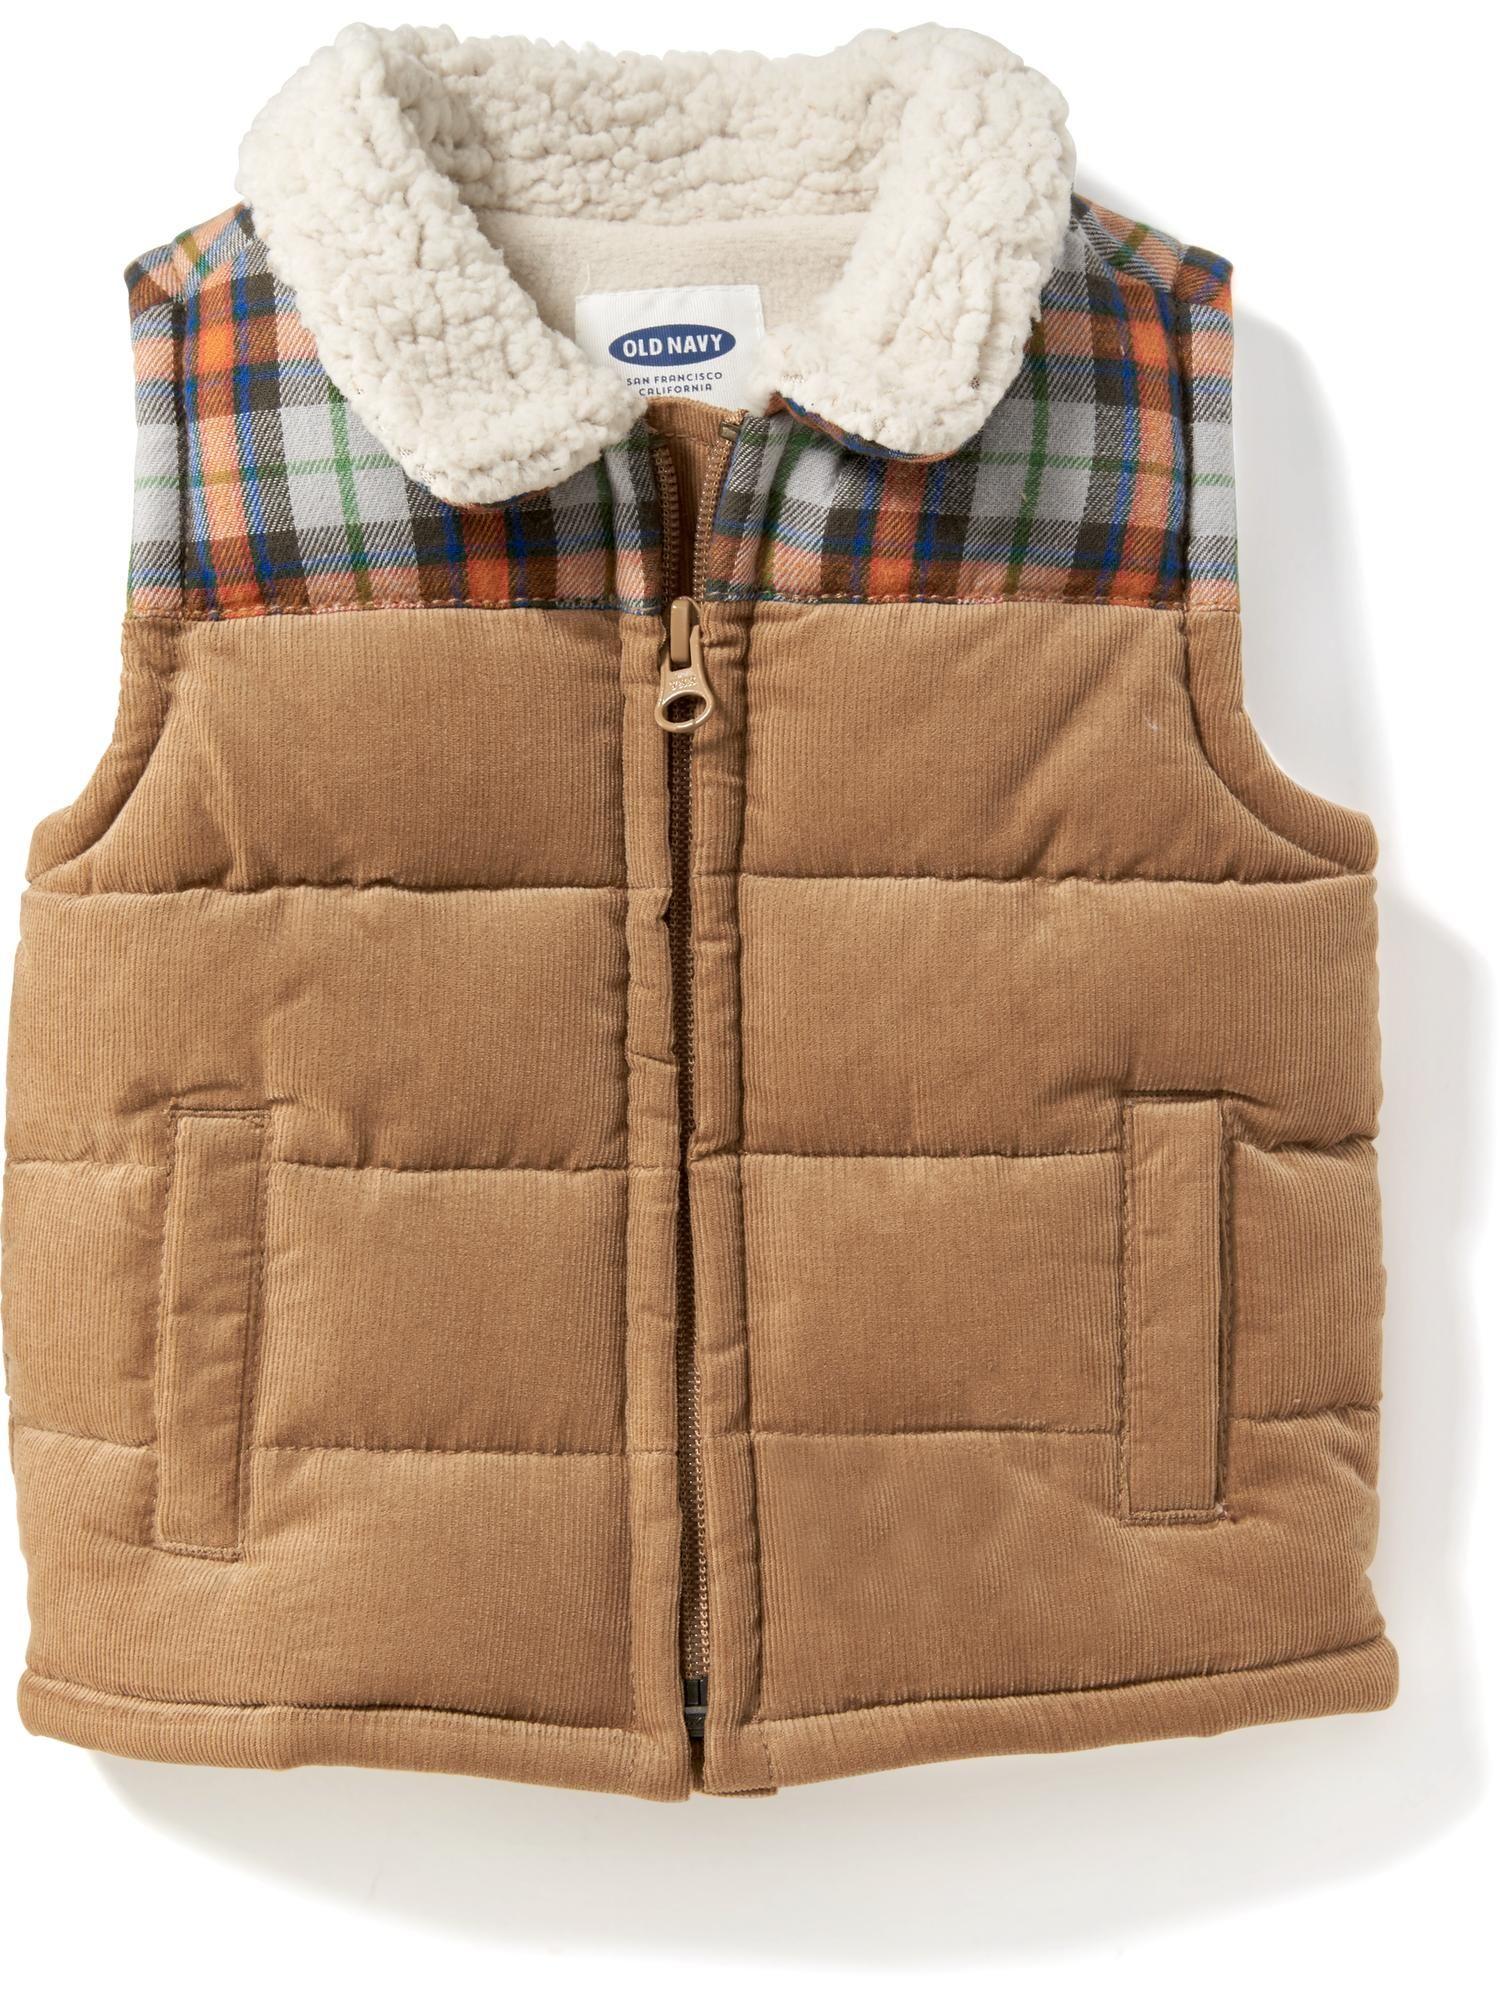 Corduroy Vest for Baby Boy   Old Navy